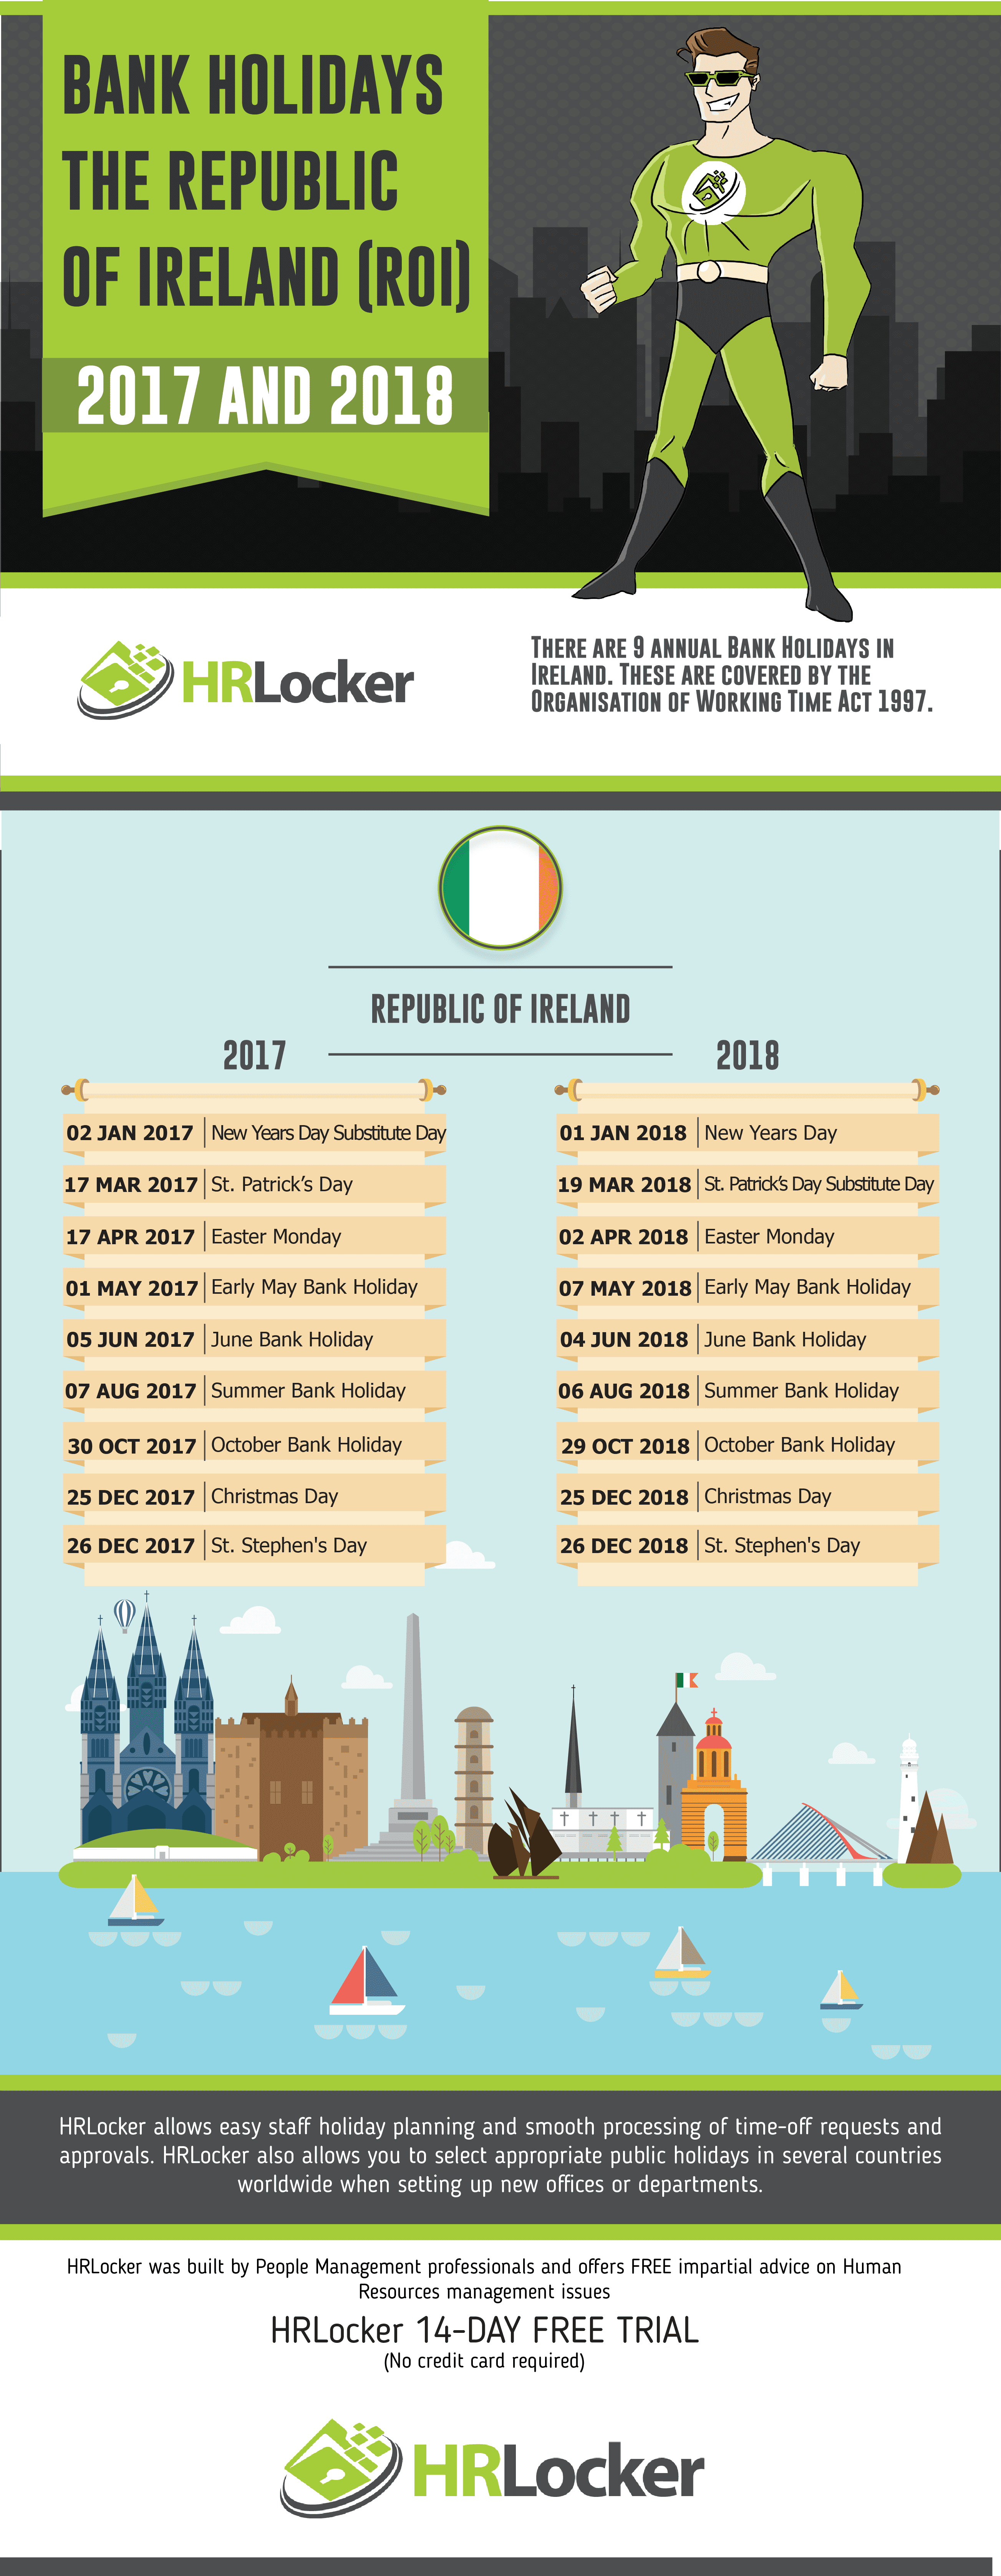 Uk Republic Of Ireland Scotland And Northern Ireland Bank Holidays 2017 And 2018